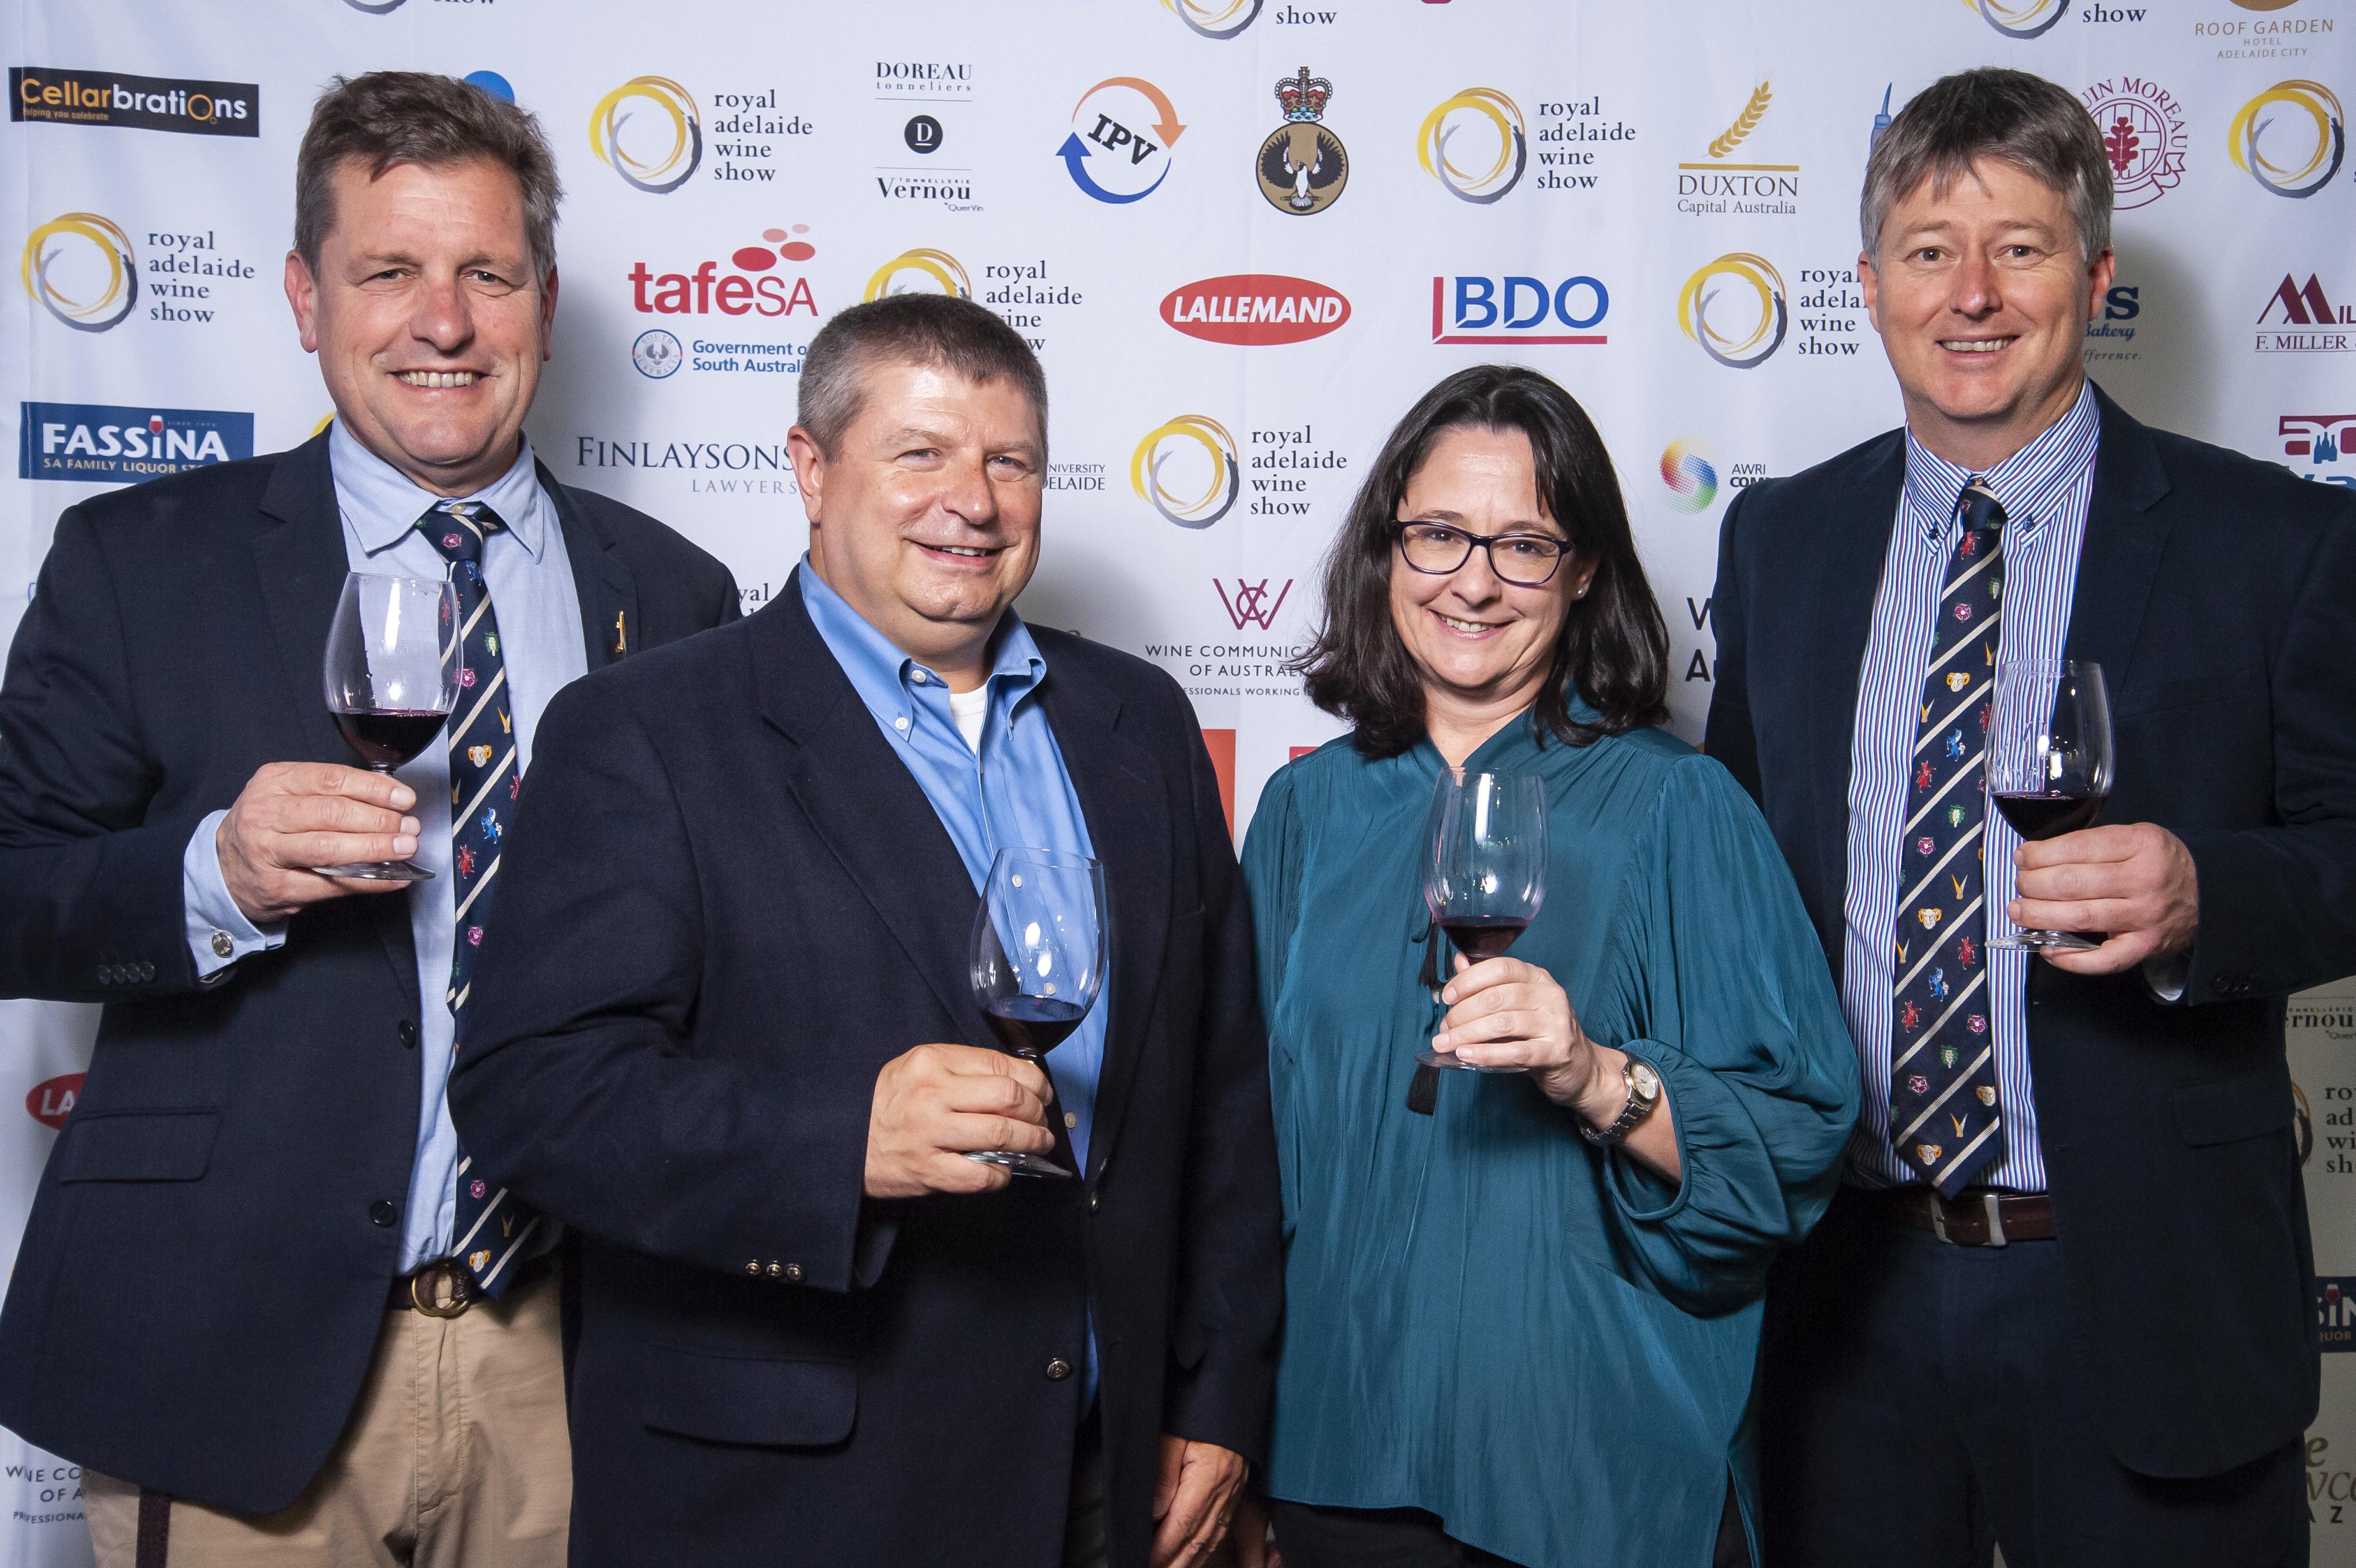 Royal Adelaide Wine ShowWayville, South AustraliaPhoto: John Krüger